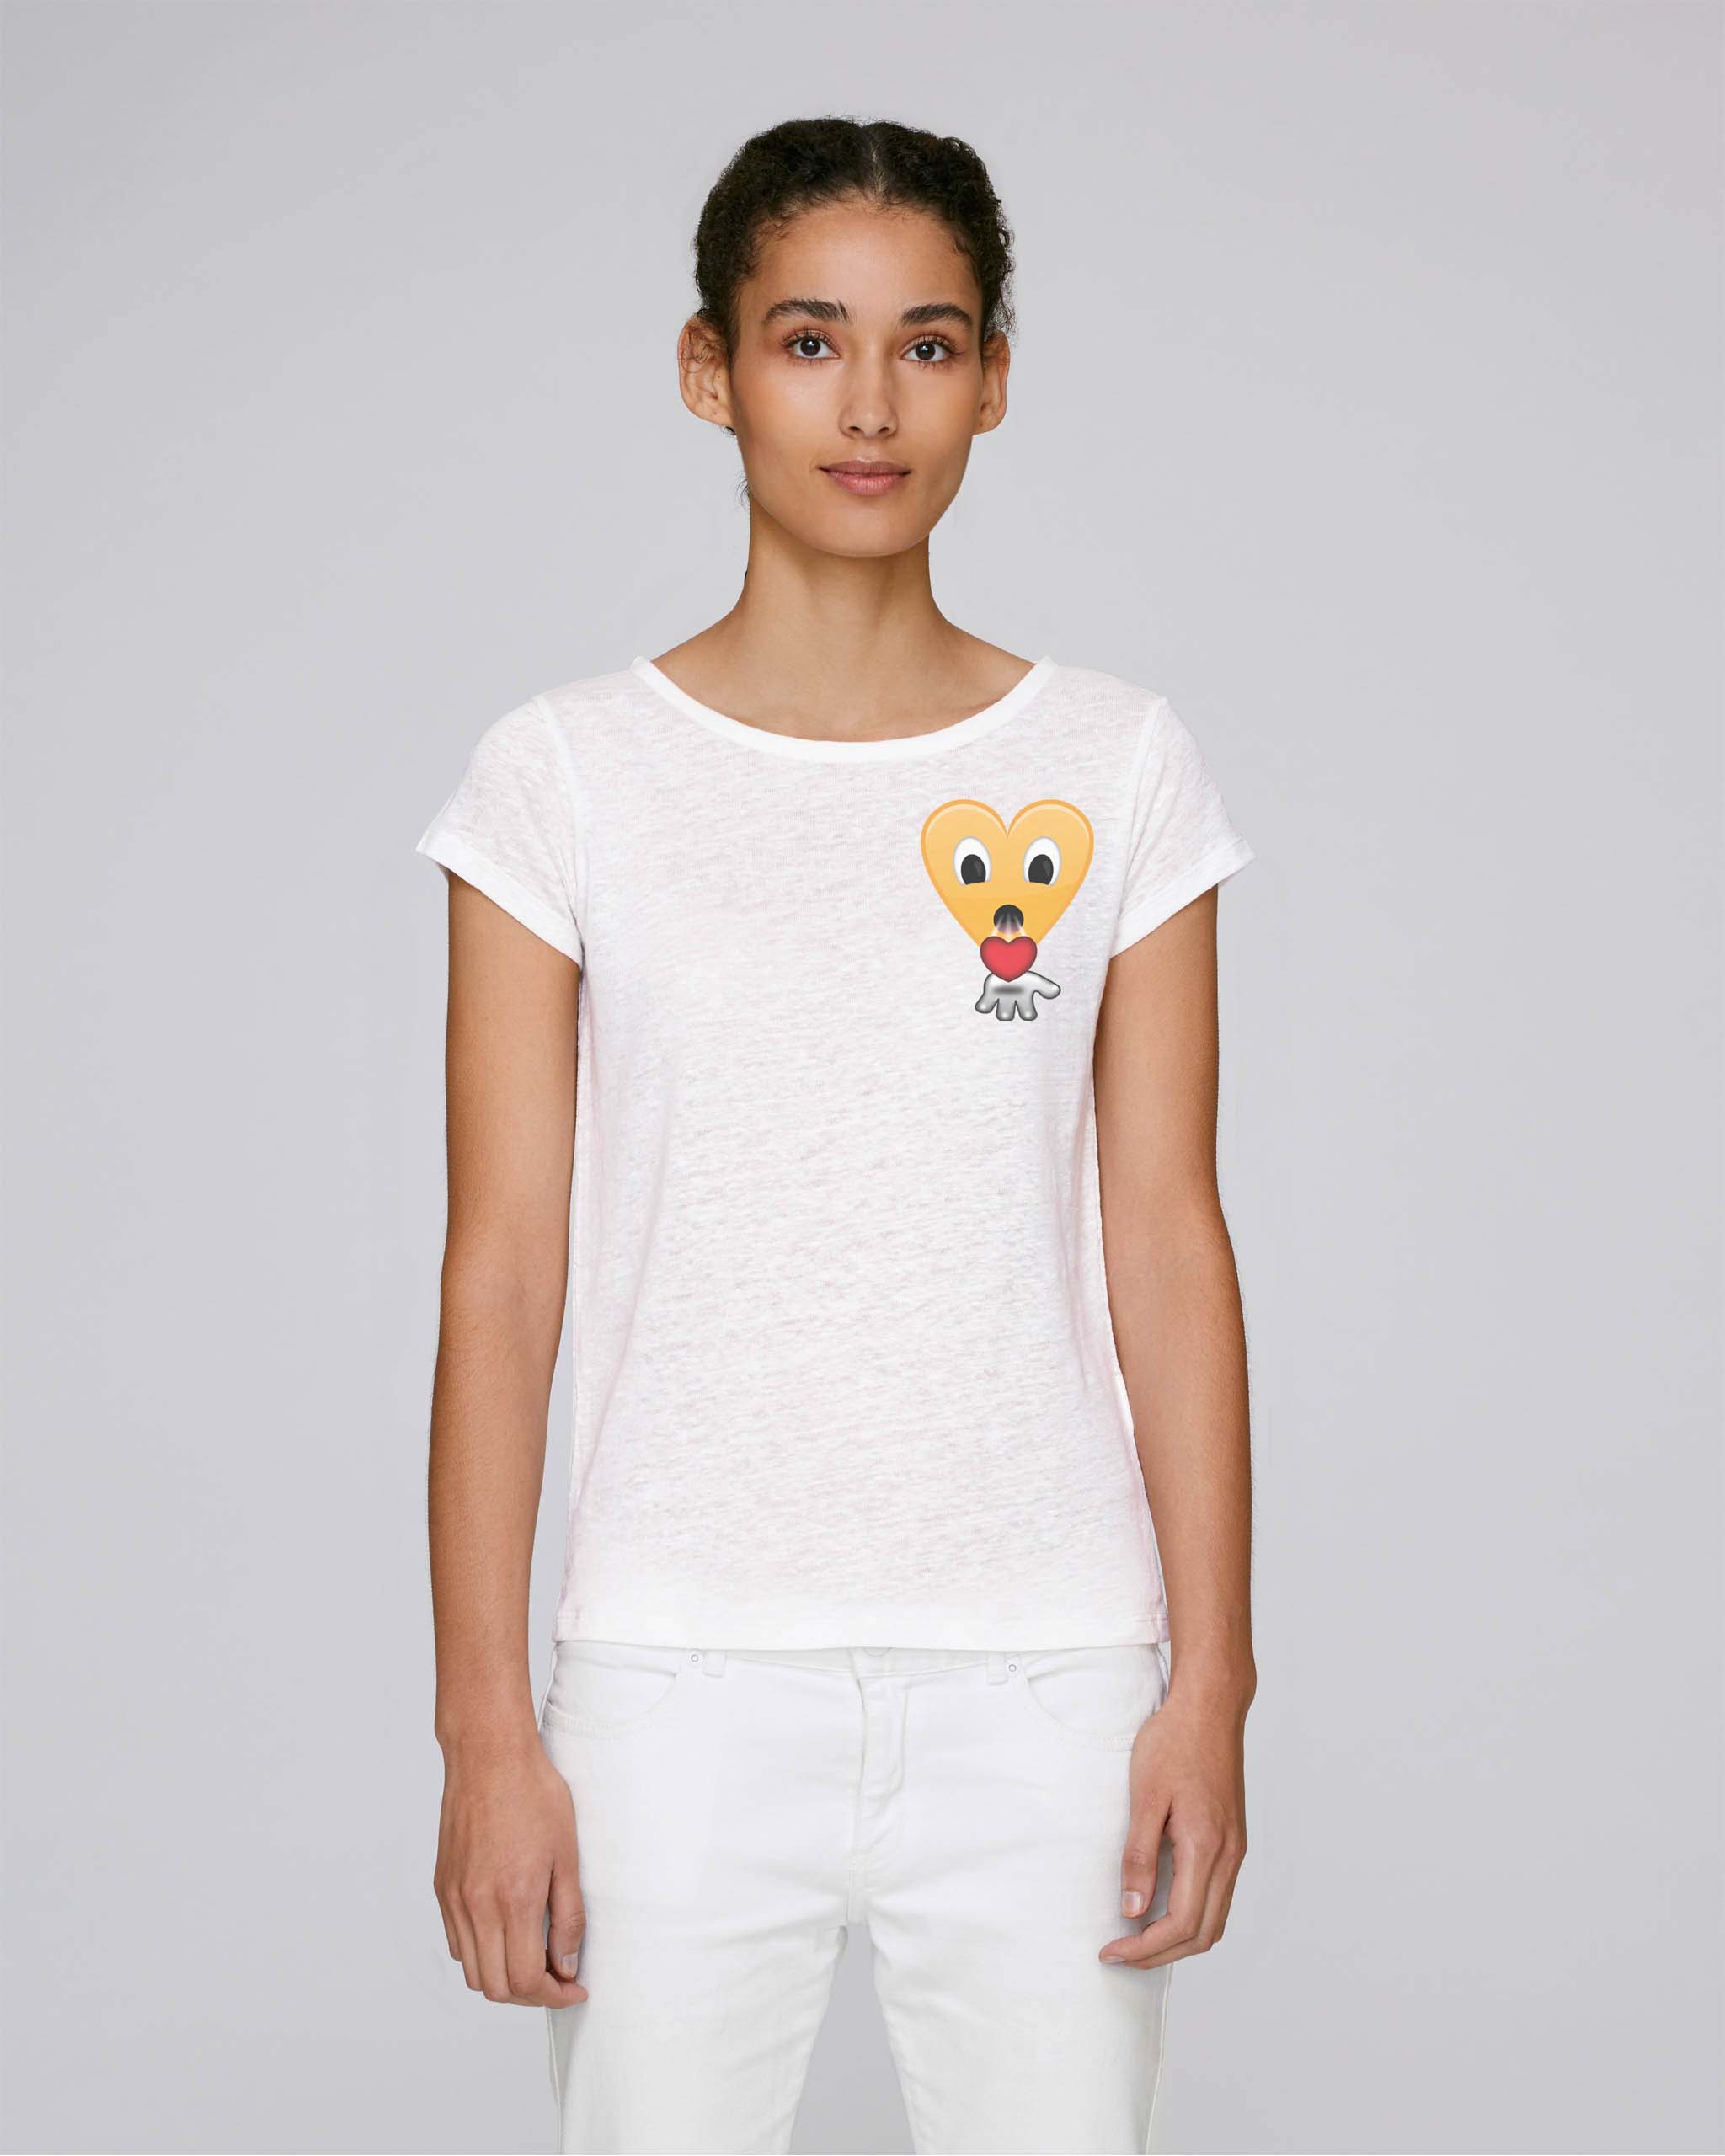 T-Shirt Bio blanc Femme - kiss tee